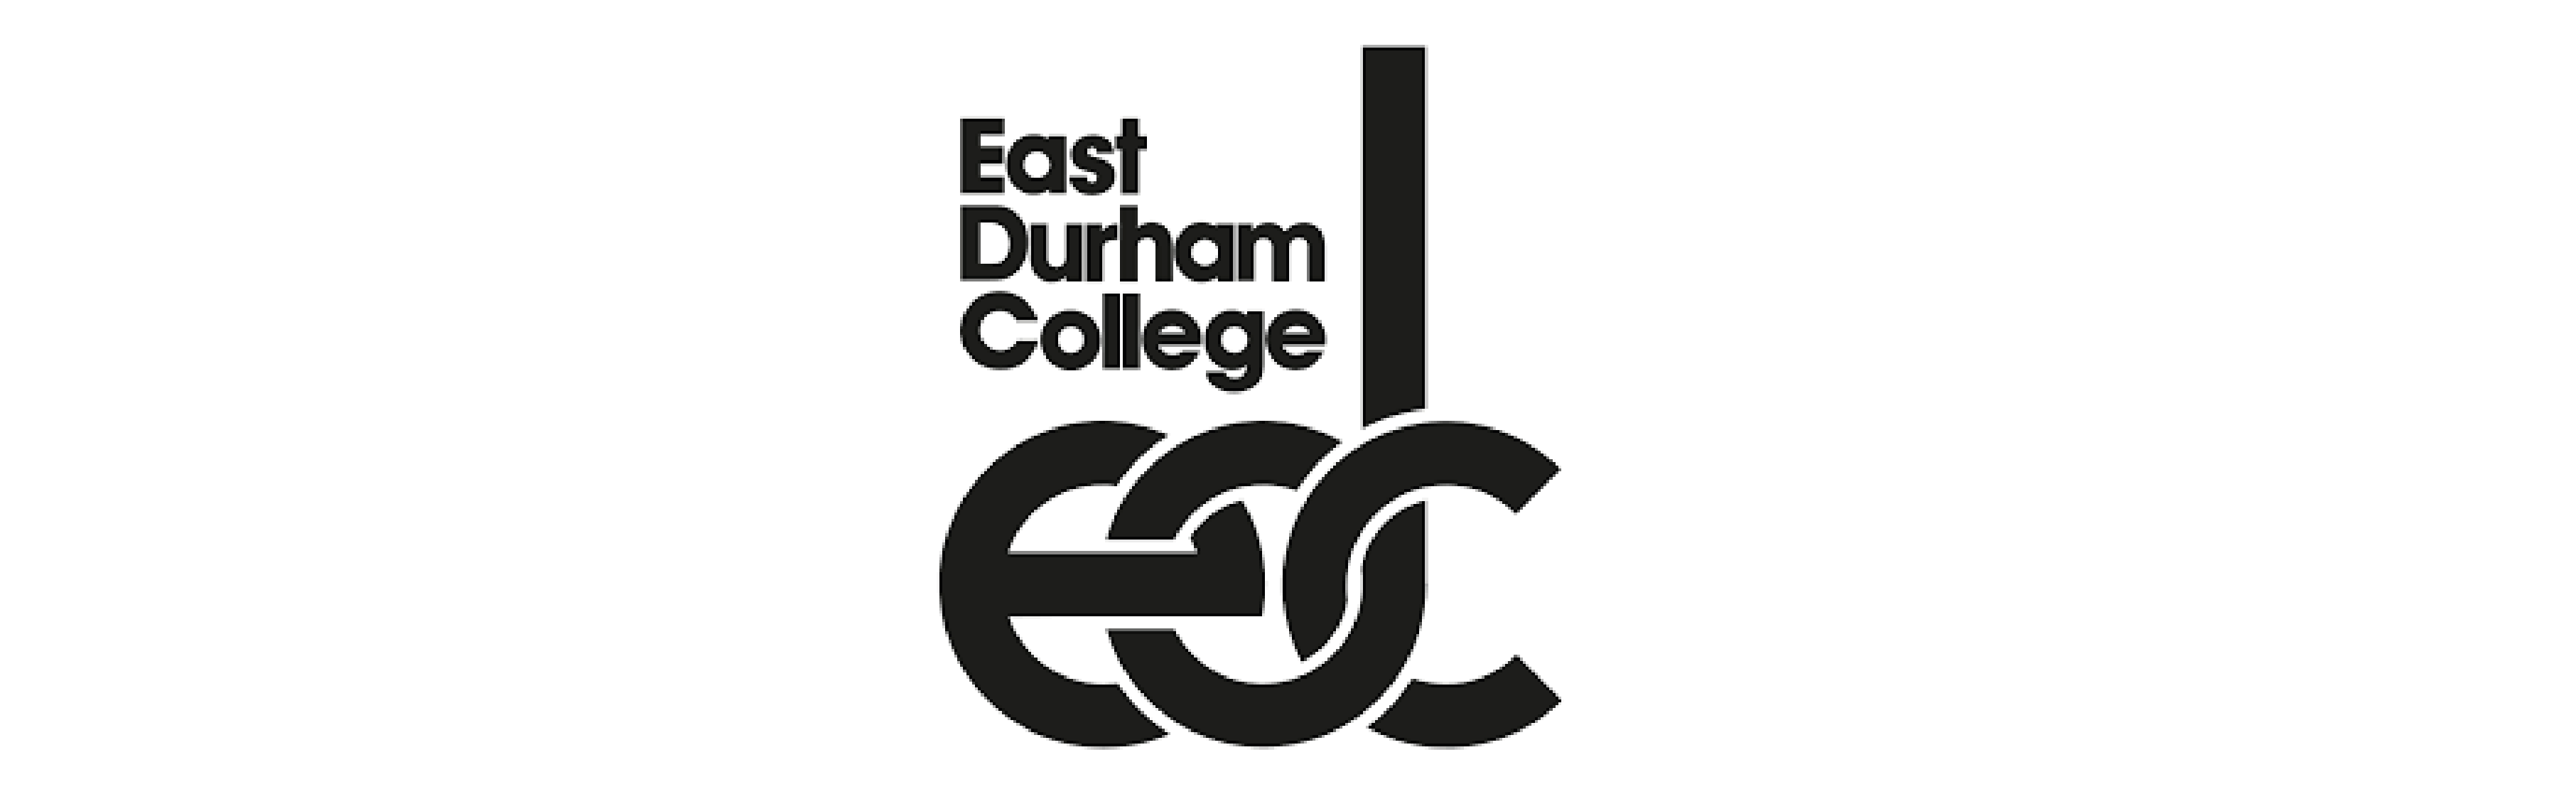 East Durham College Virtual Tour